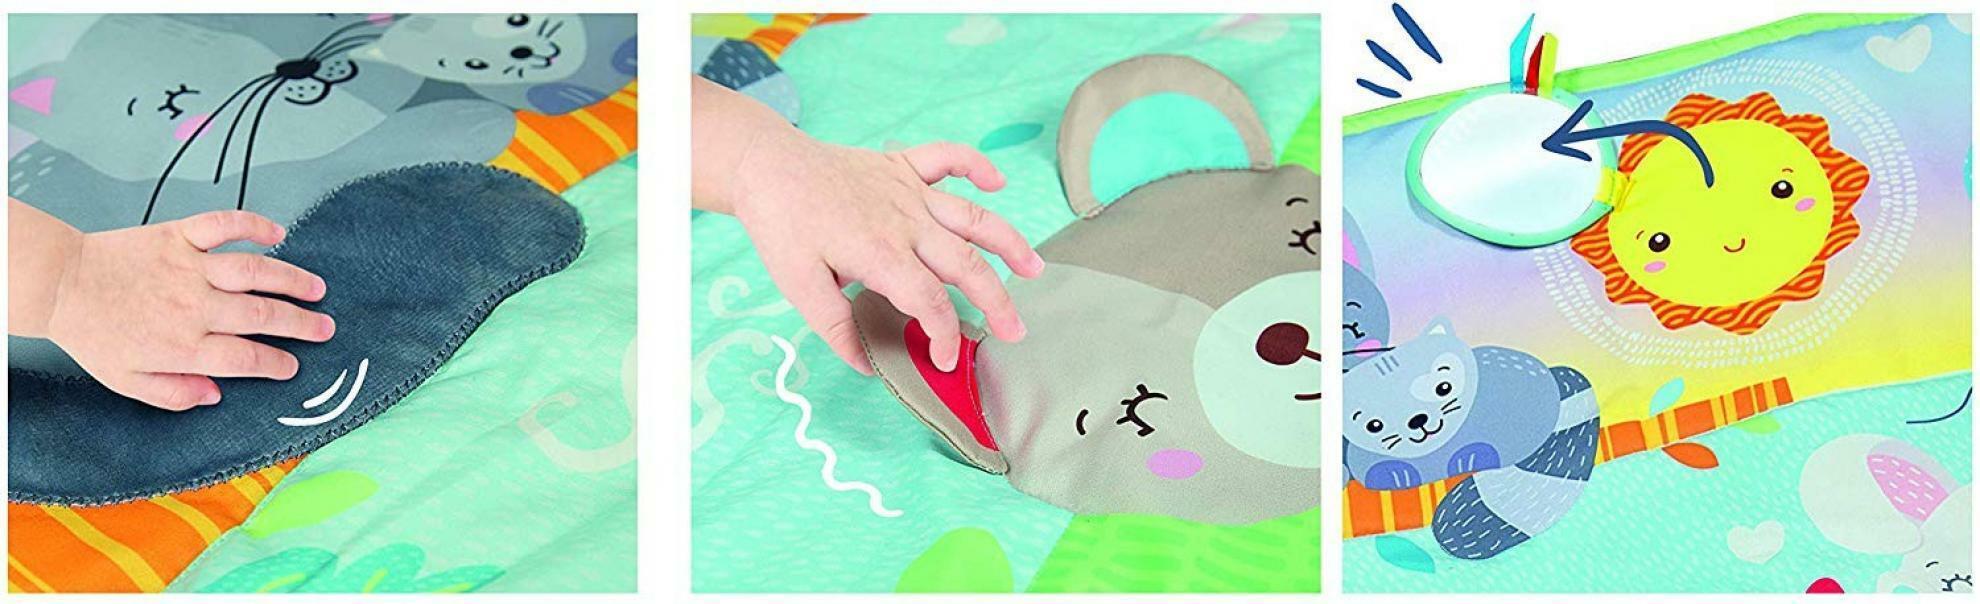 clementoni hug me play mat - tappeto sensoriale 17283